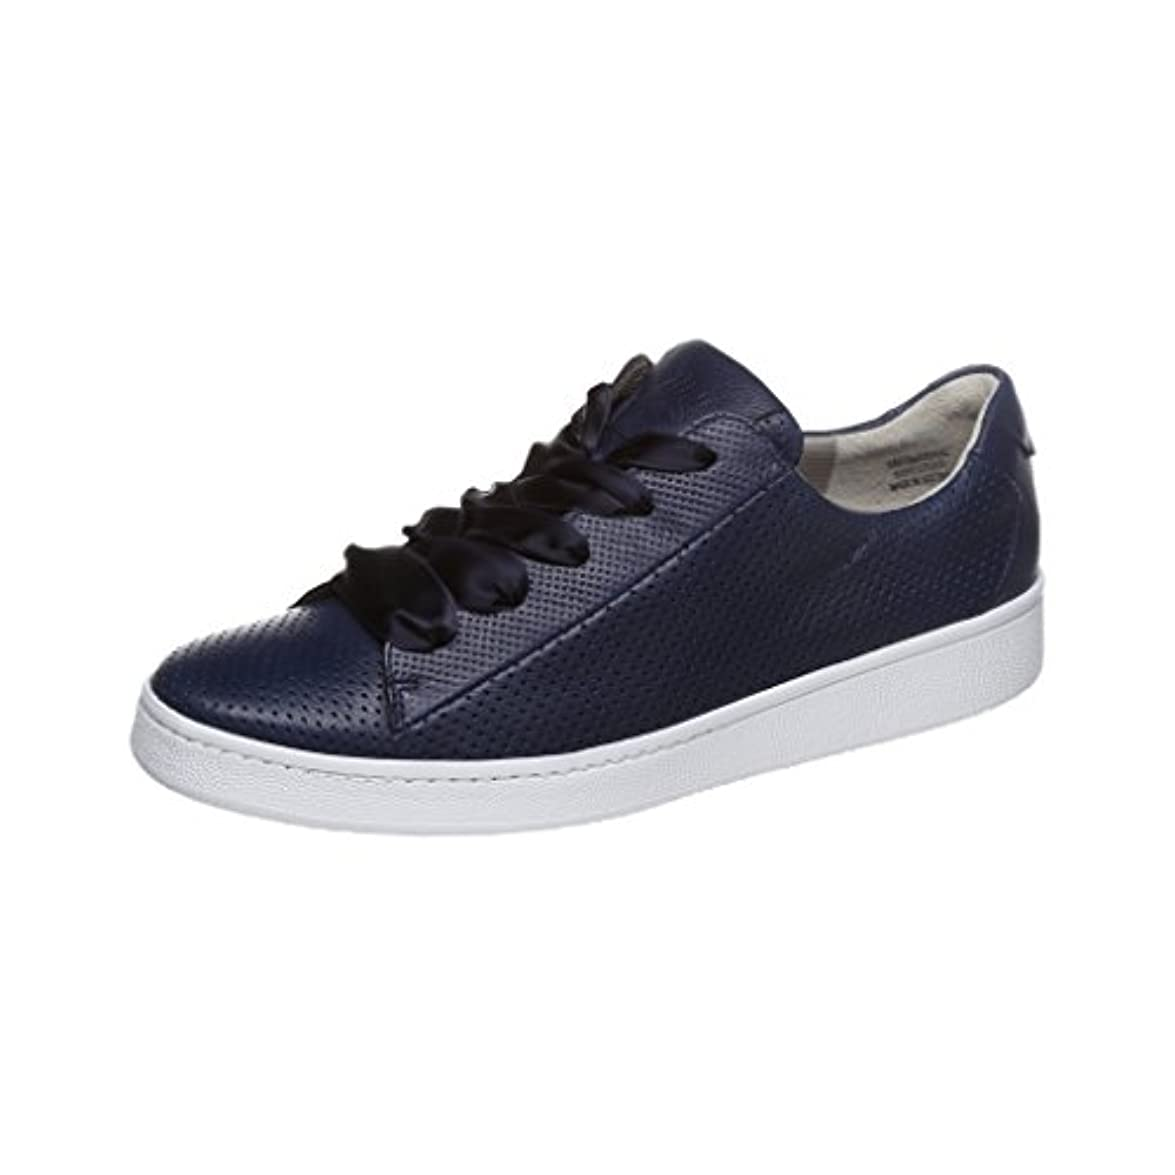 Paul Green 4583 042 Sneaker Donna